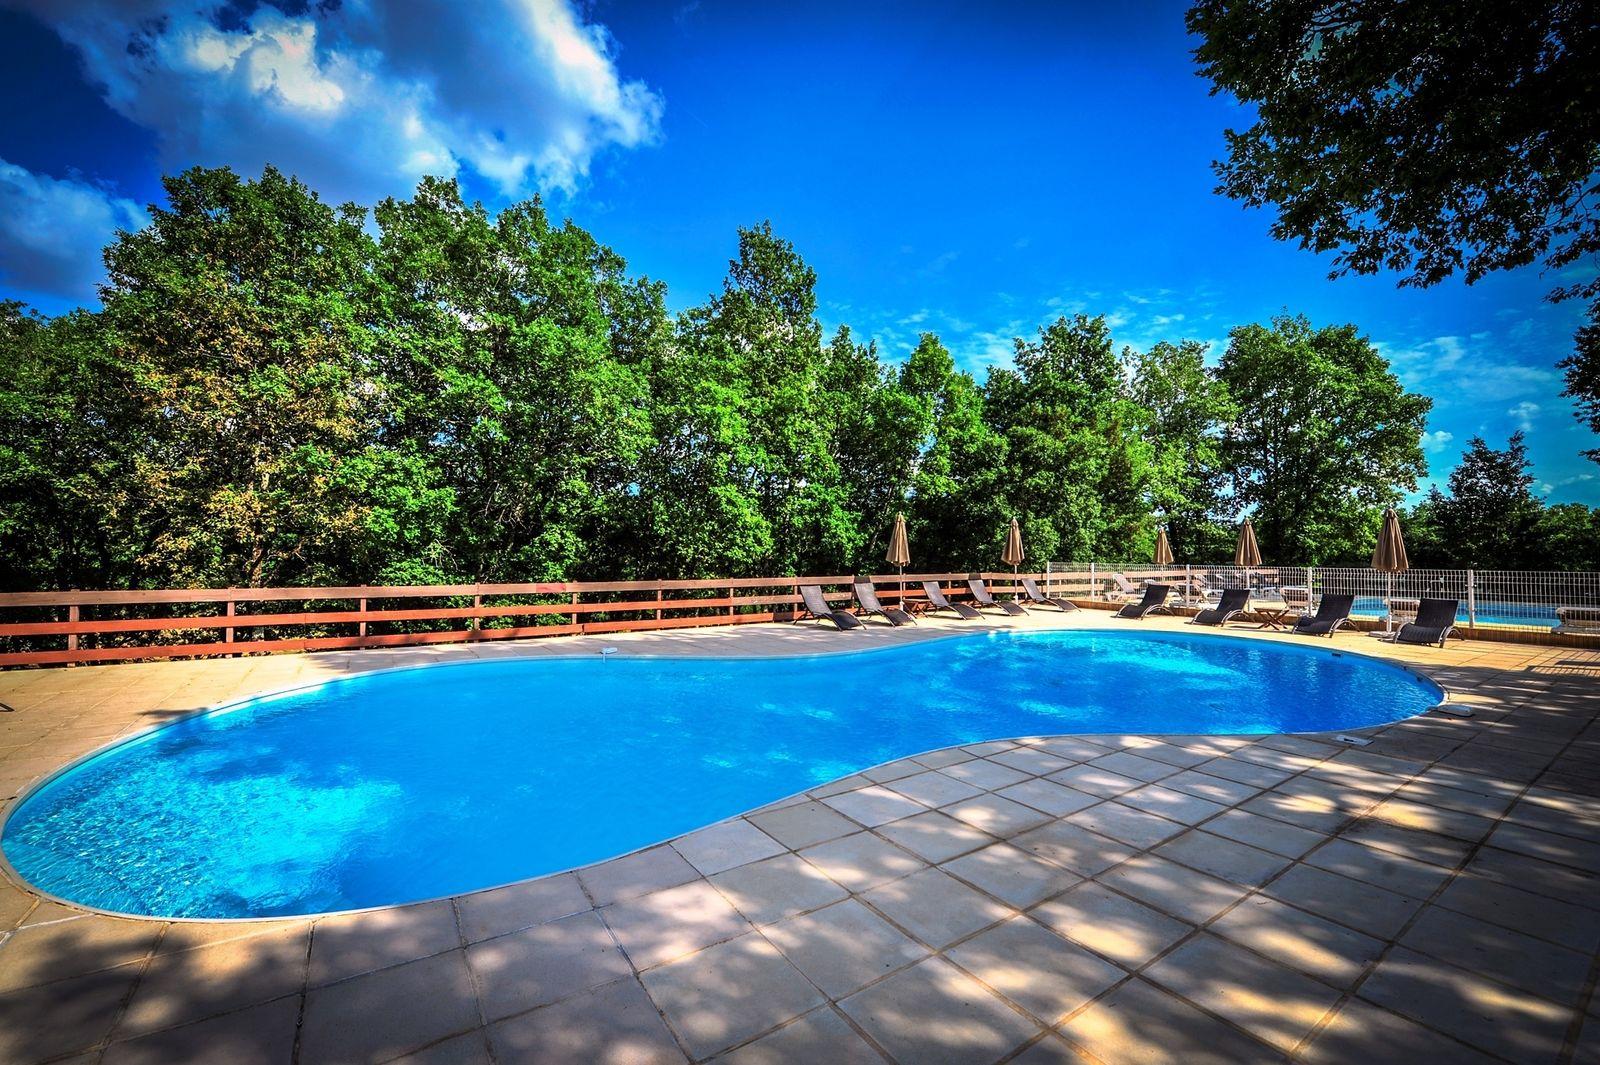 Afbeelding van Souillac Country Club - vakantiewoning Corrèze Confort in Dordogne